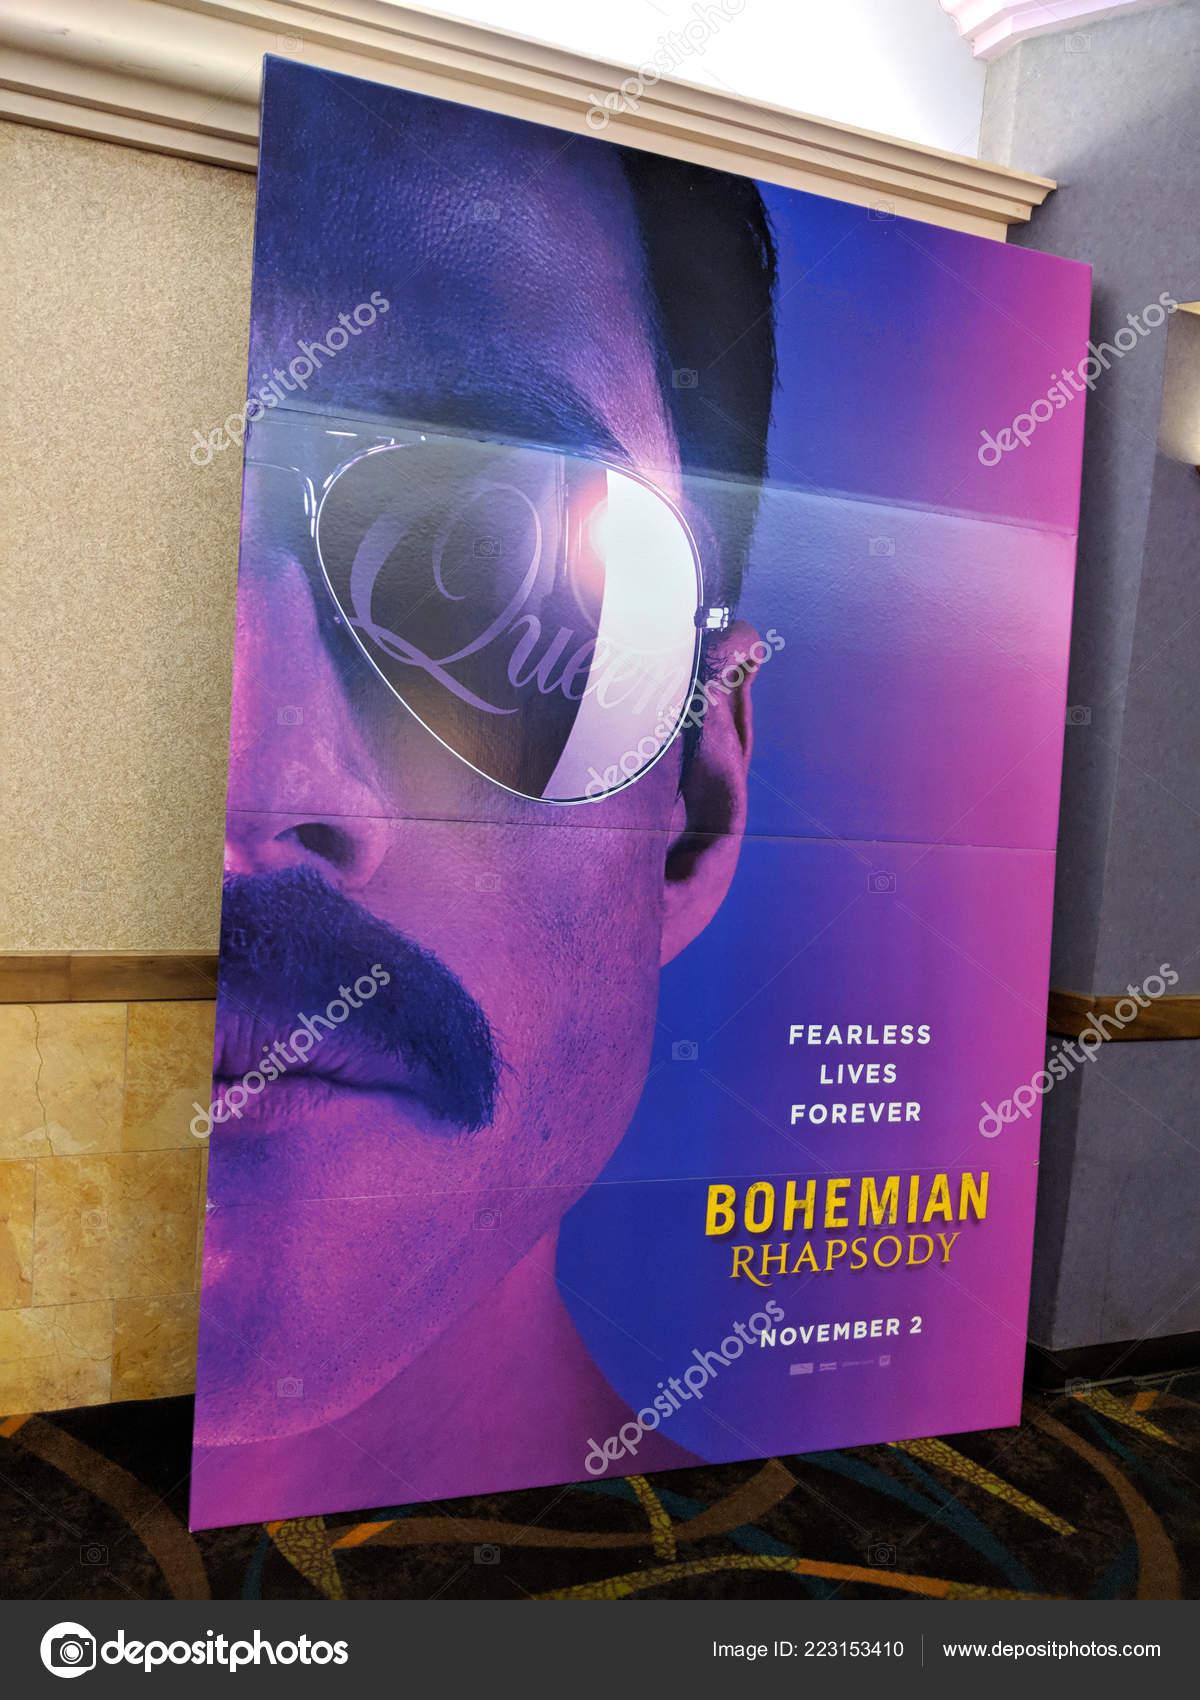 Honolulu June 2018 Bohemian Rhapsody Movie Poster Featuring Band